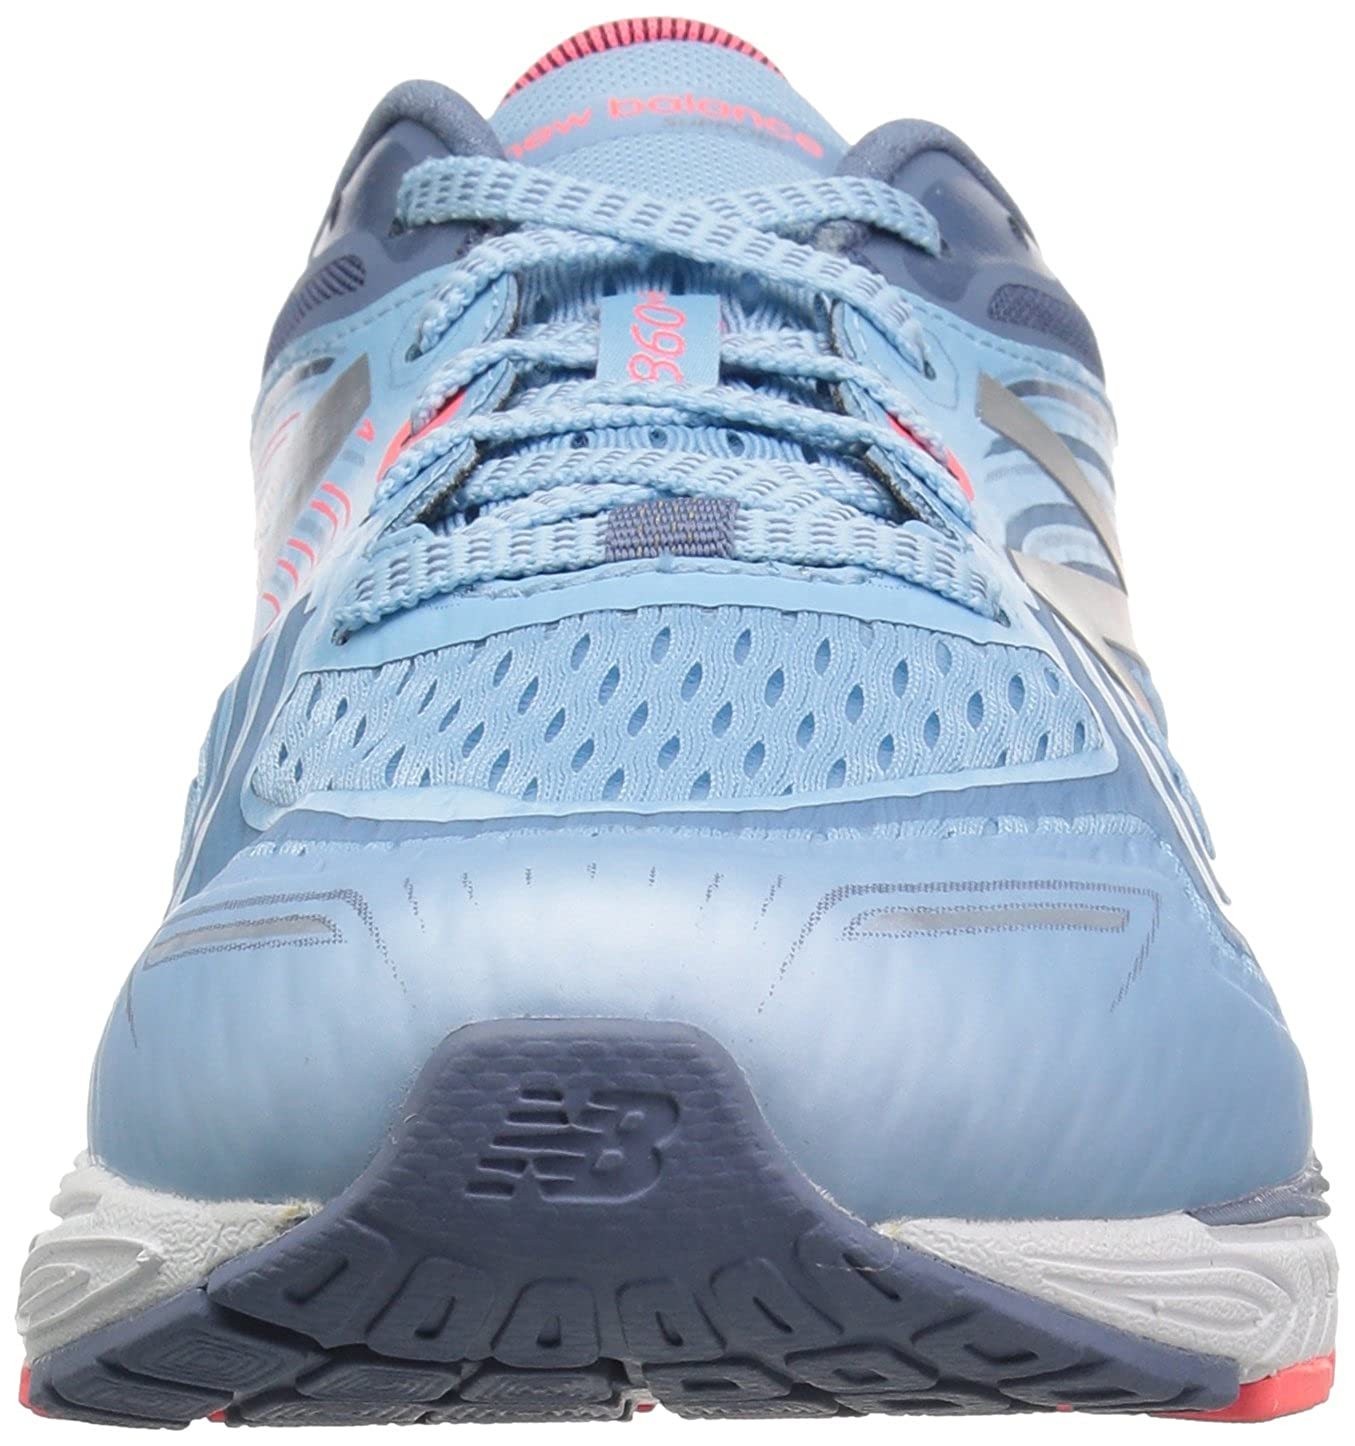 New Balance Unisex Kid's 860v8 Running-schuhe, Running-schuhe, Running-schuhe, Clear Sky Guava, 13.5 M US Little Kid 49480b